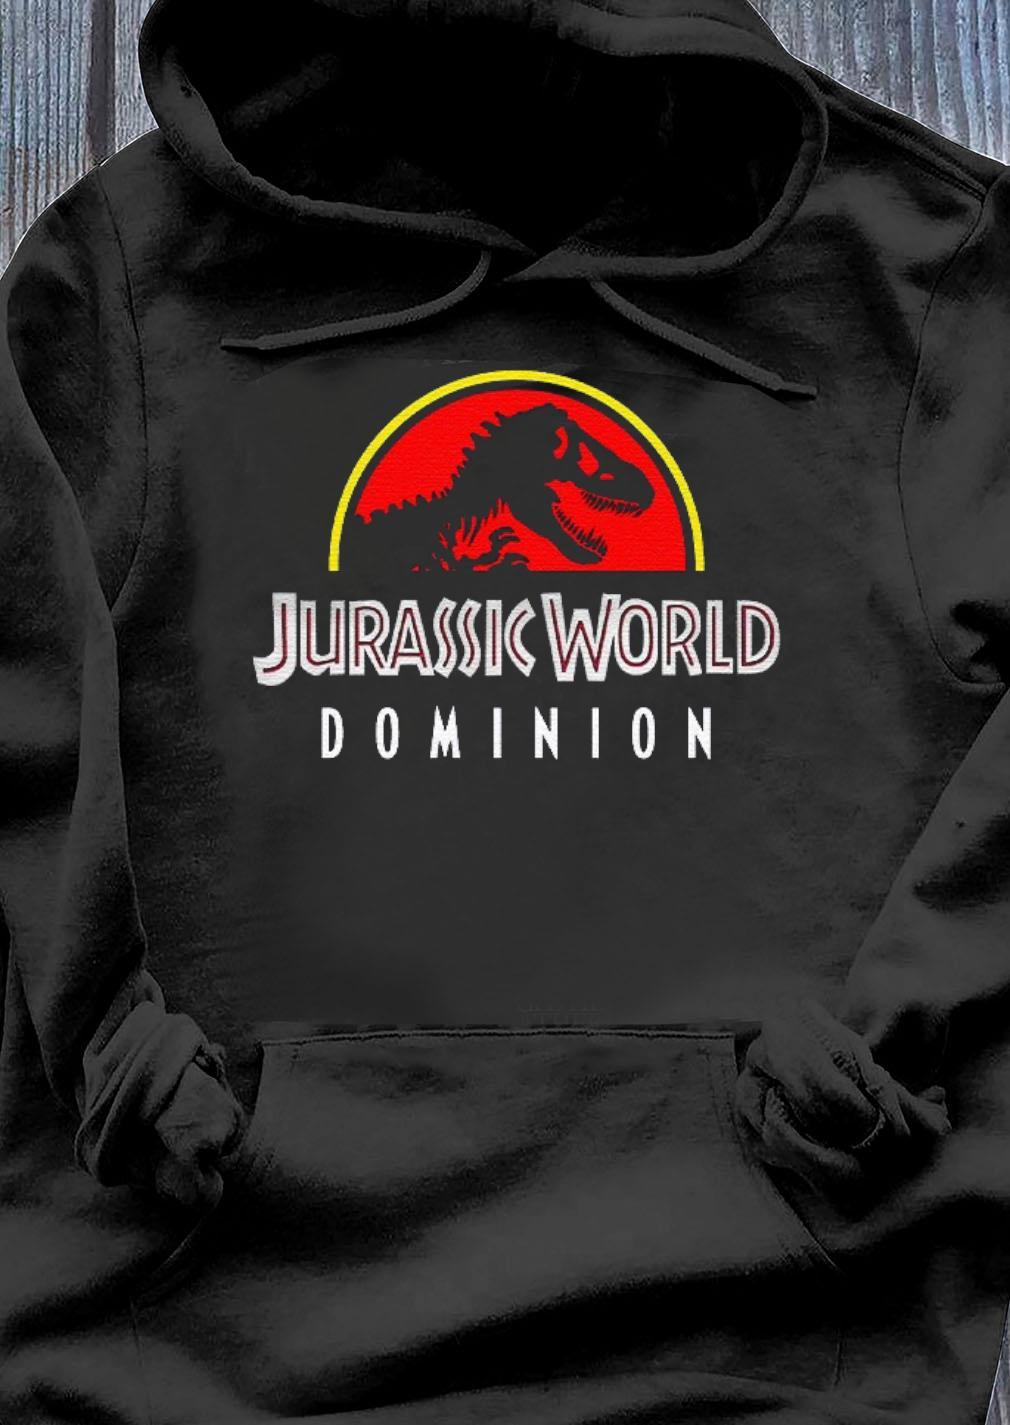 Jurassic World Dominion s Hoodie